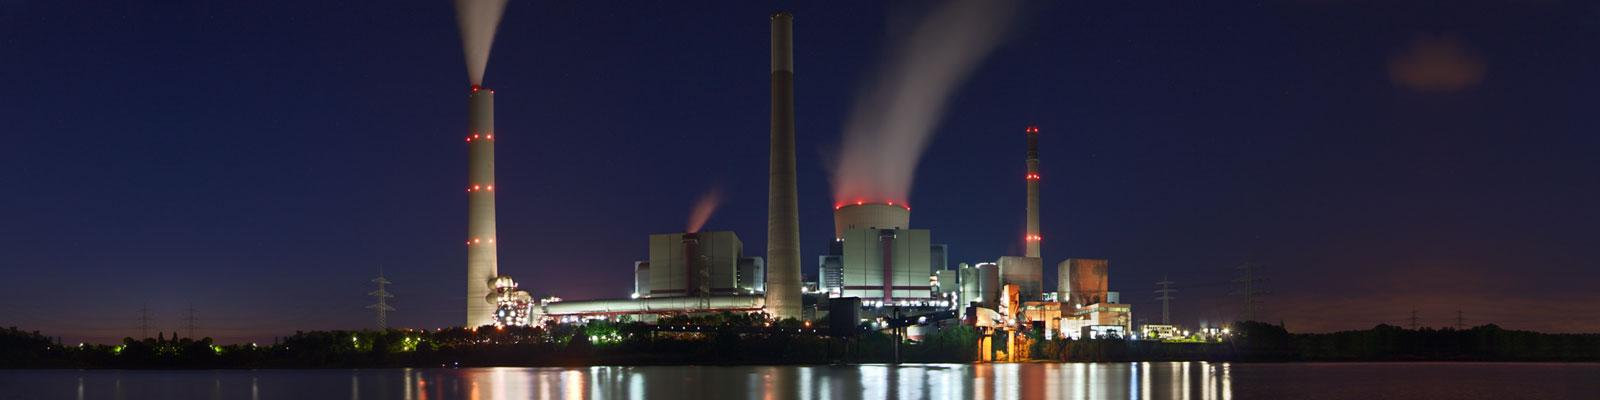 power generation facility